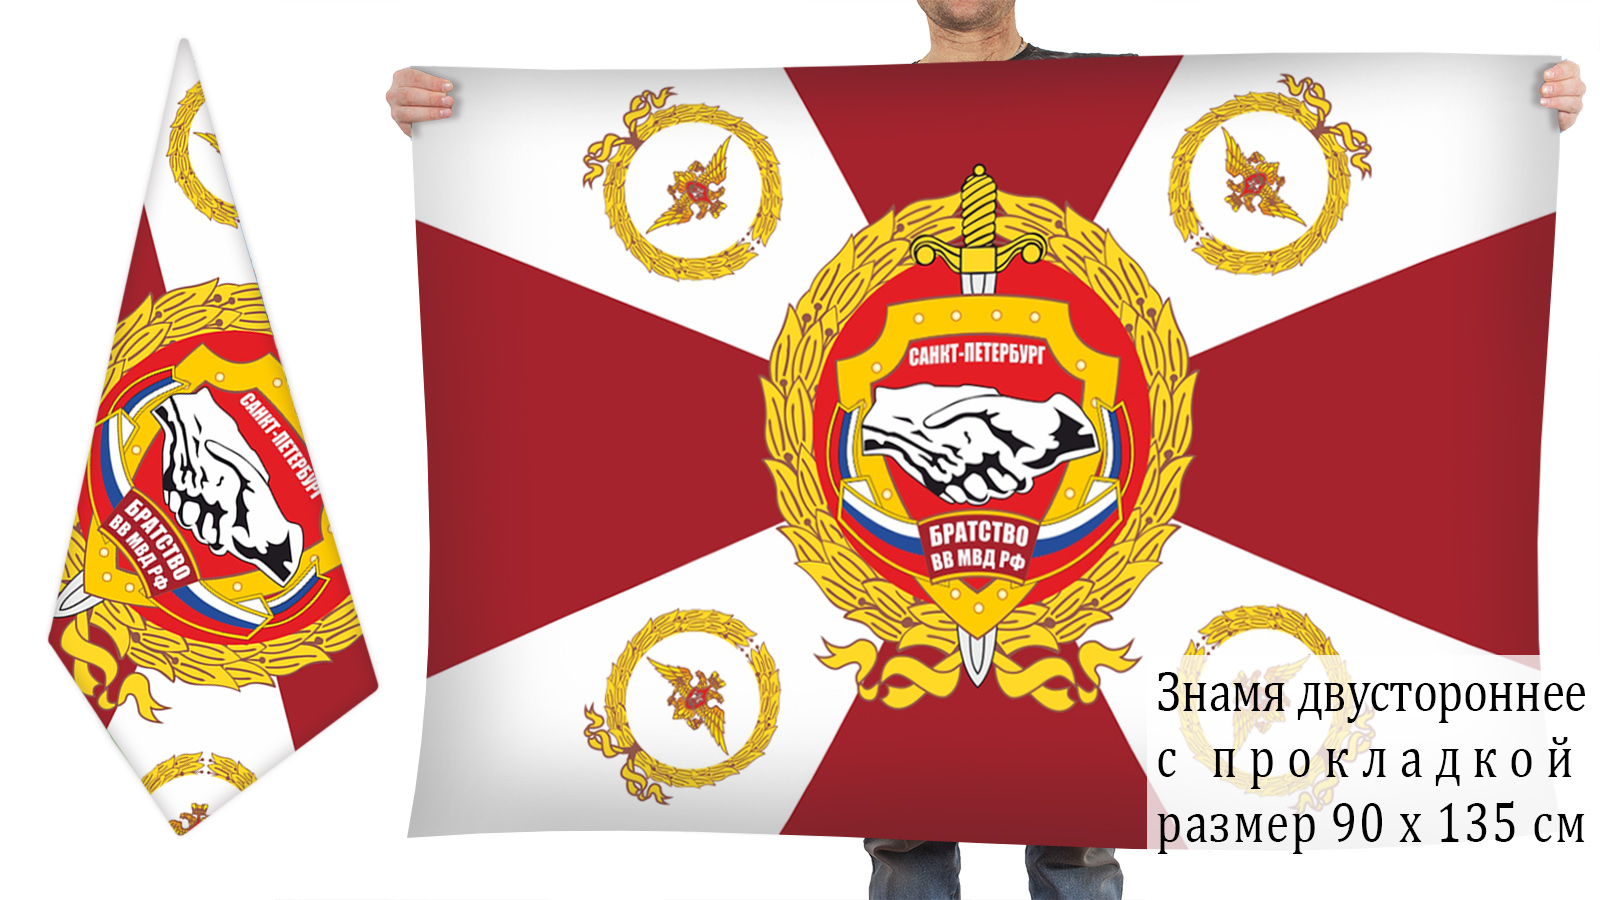 Двусторонний флаг братства внутренних войск Санкт-Петербурга